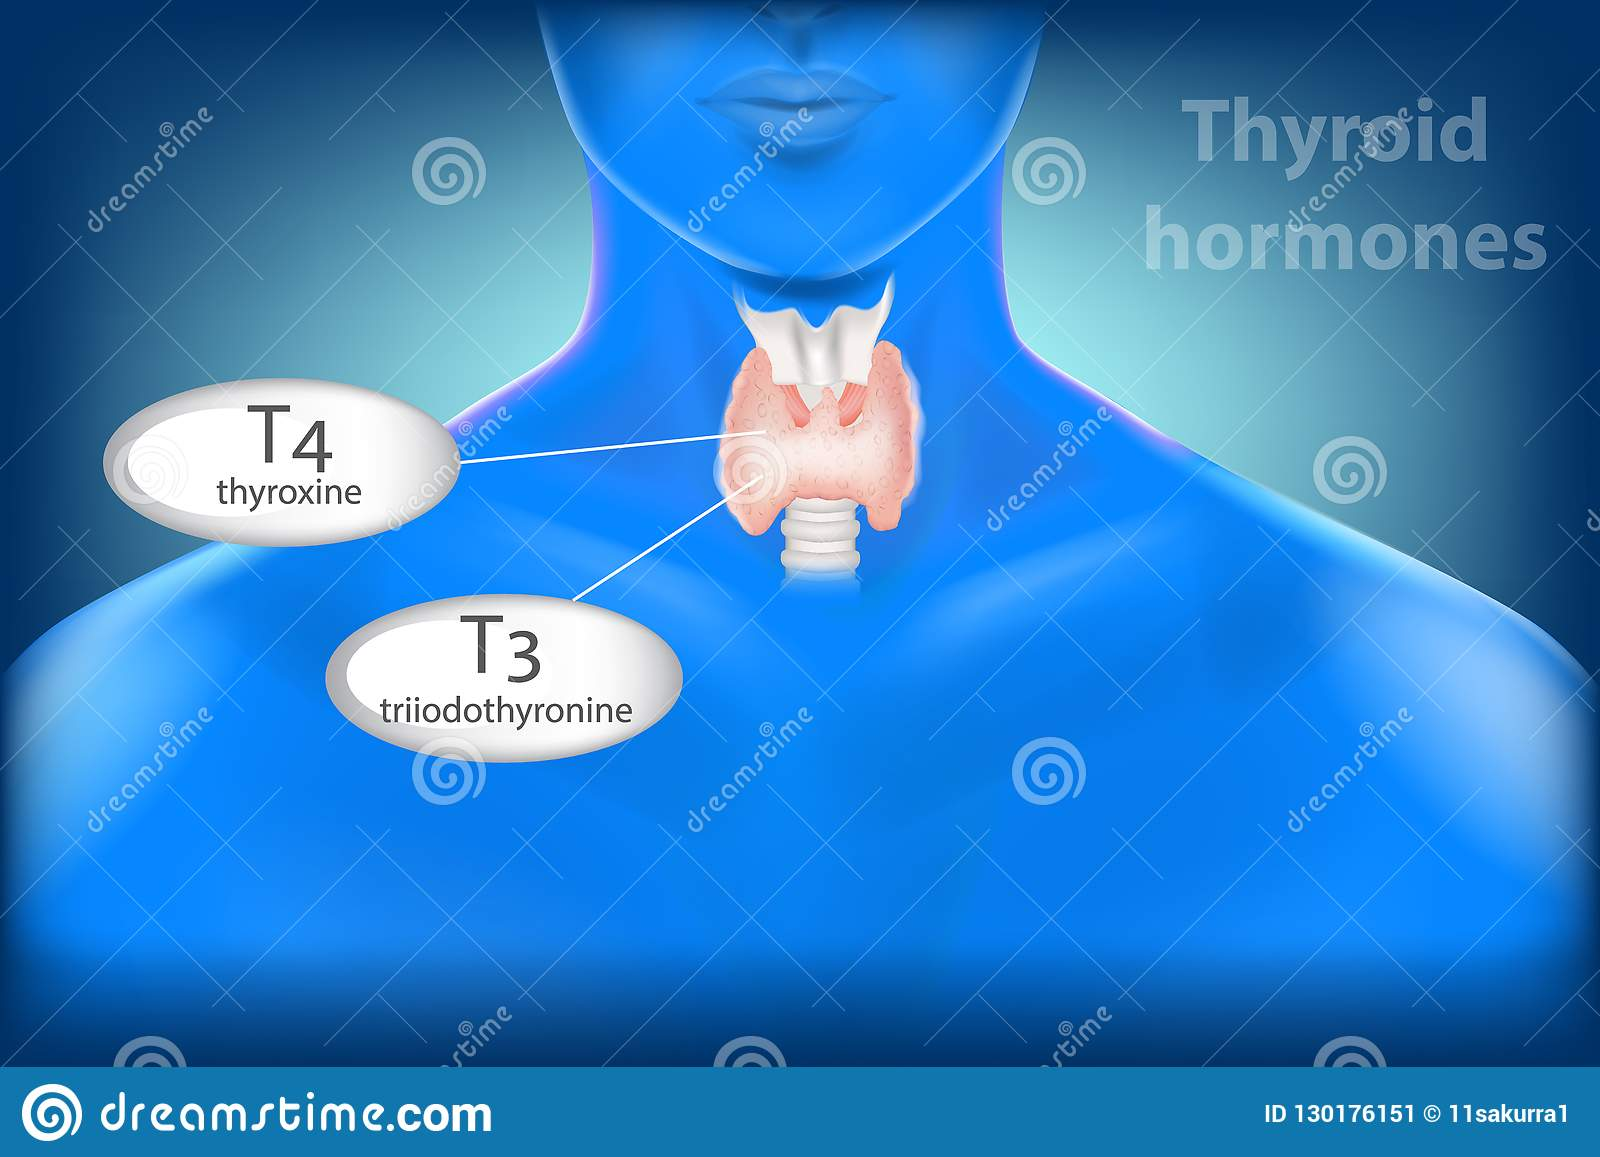 Thyroid Gland Anatomy Thyroid Hormones Stock Vector Illustration